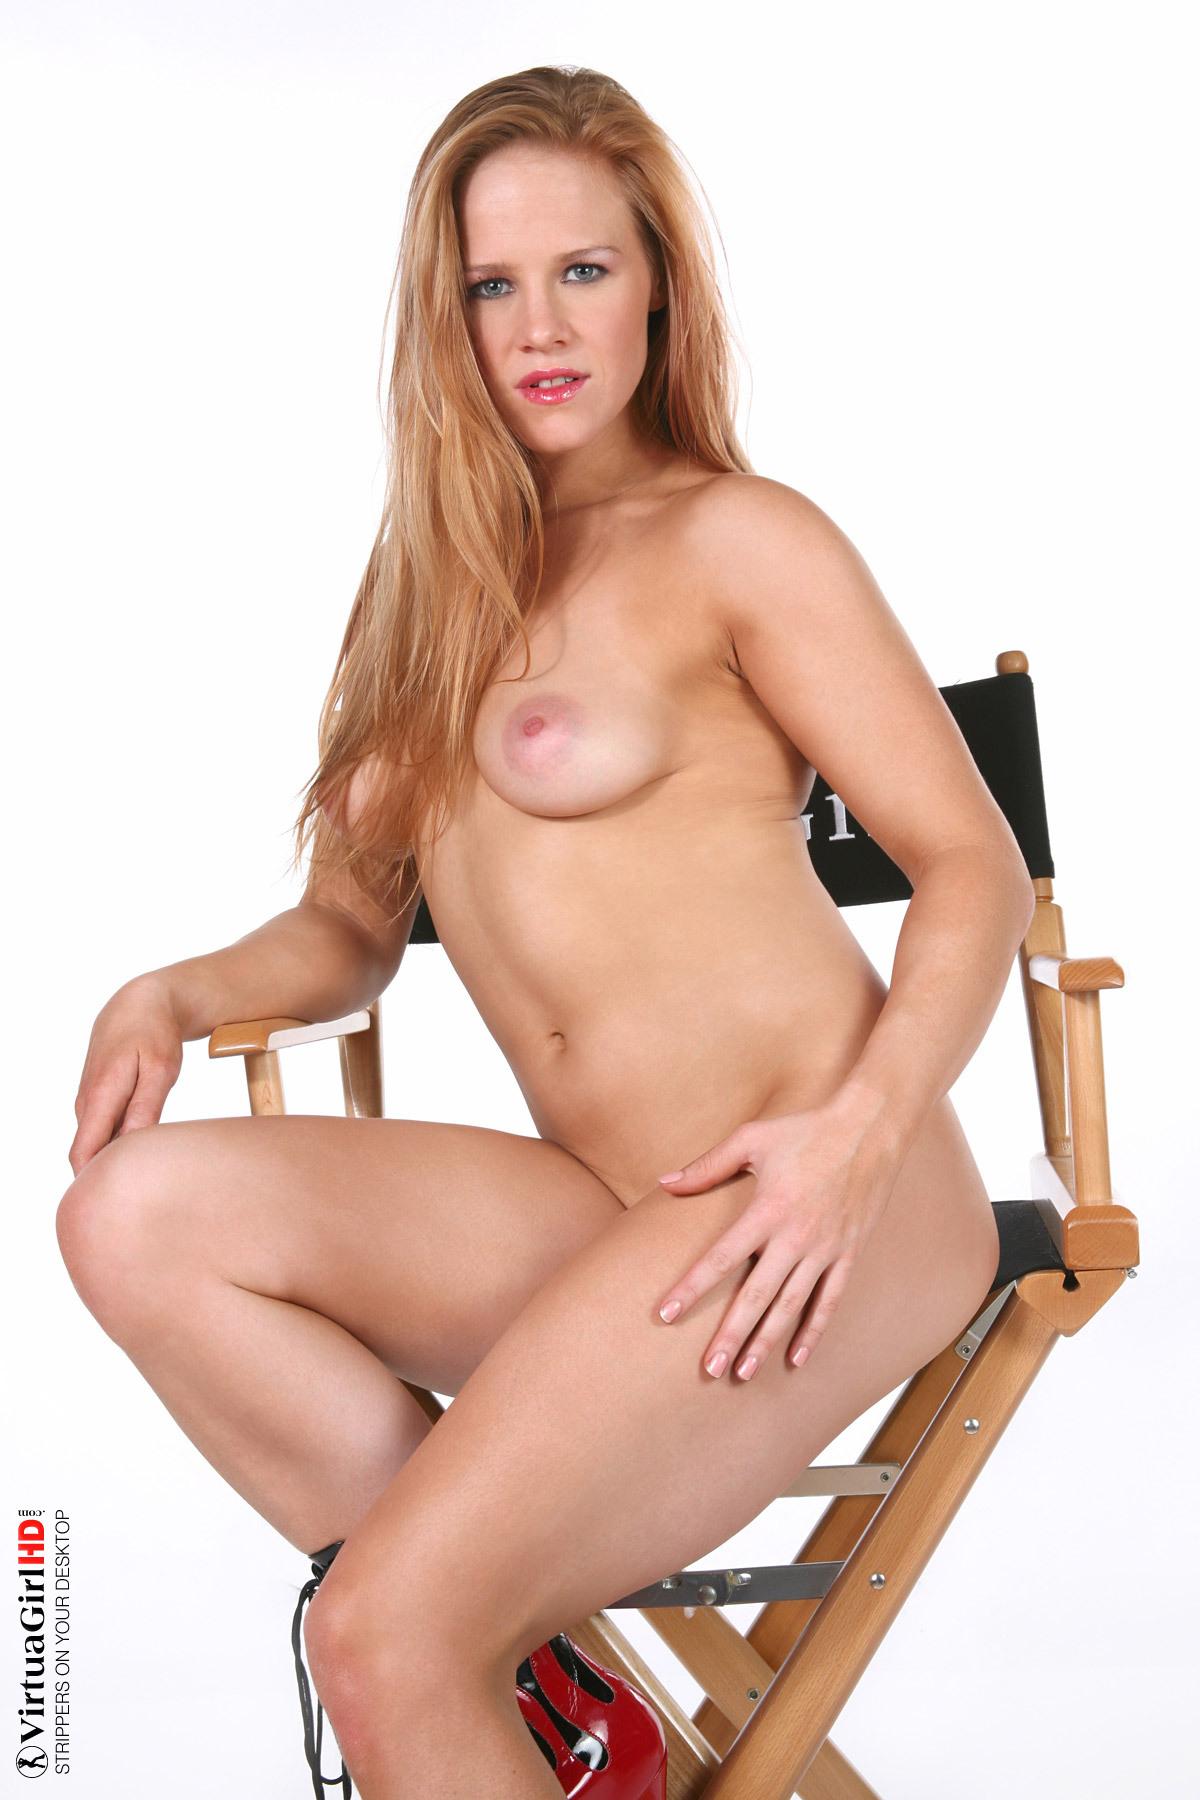 free hd nude wallpaper